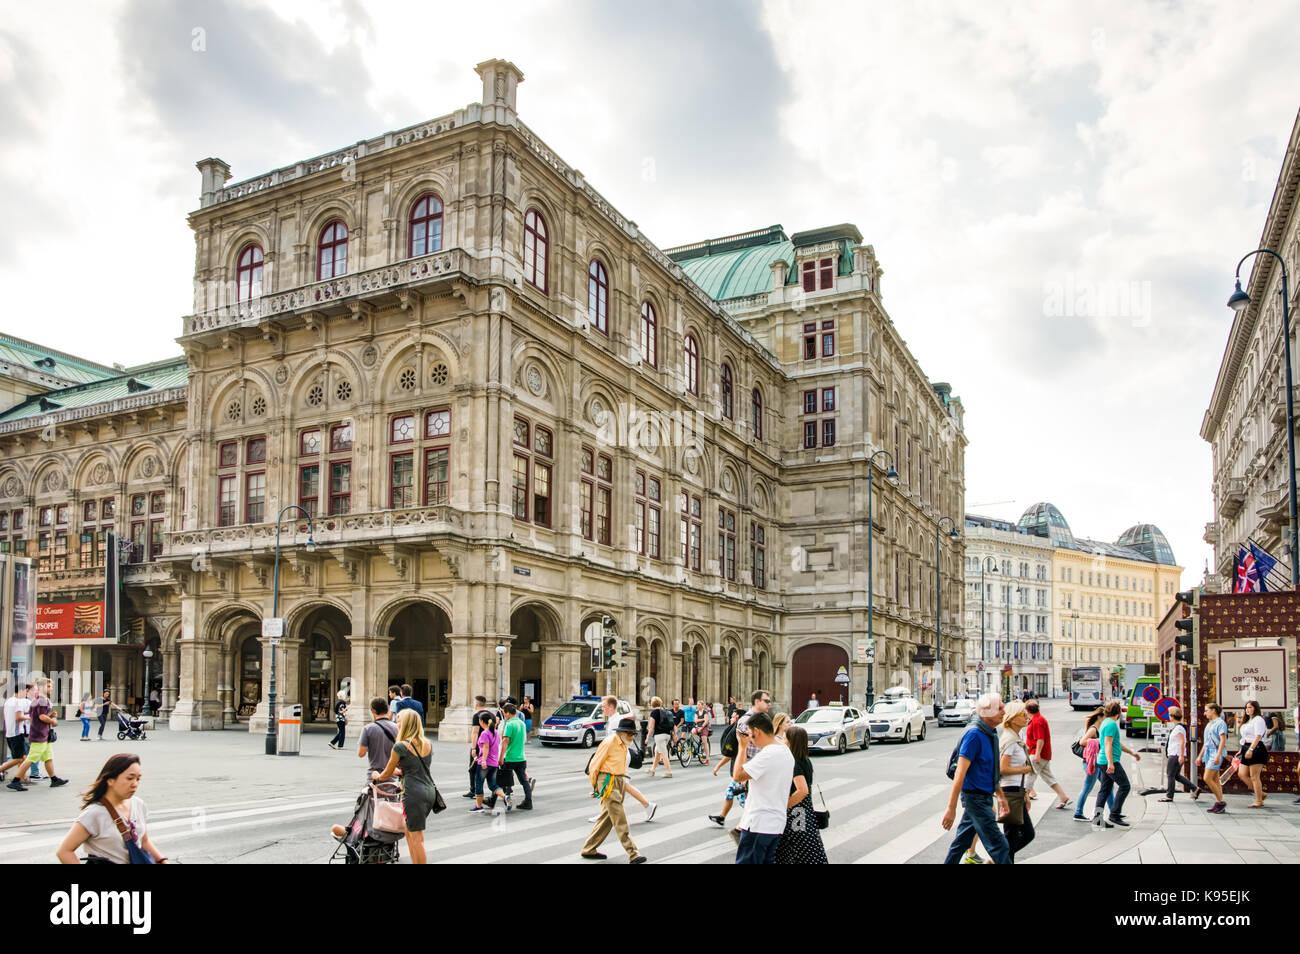 VIENNA, AUSTRIA - AUGUST 28: Tourists at the State Opera of  Vienna, Austria on August 28, 2017. - Stock Image